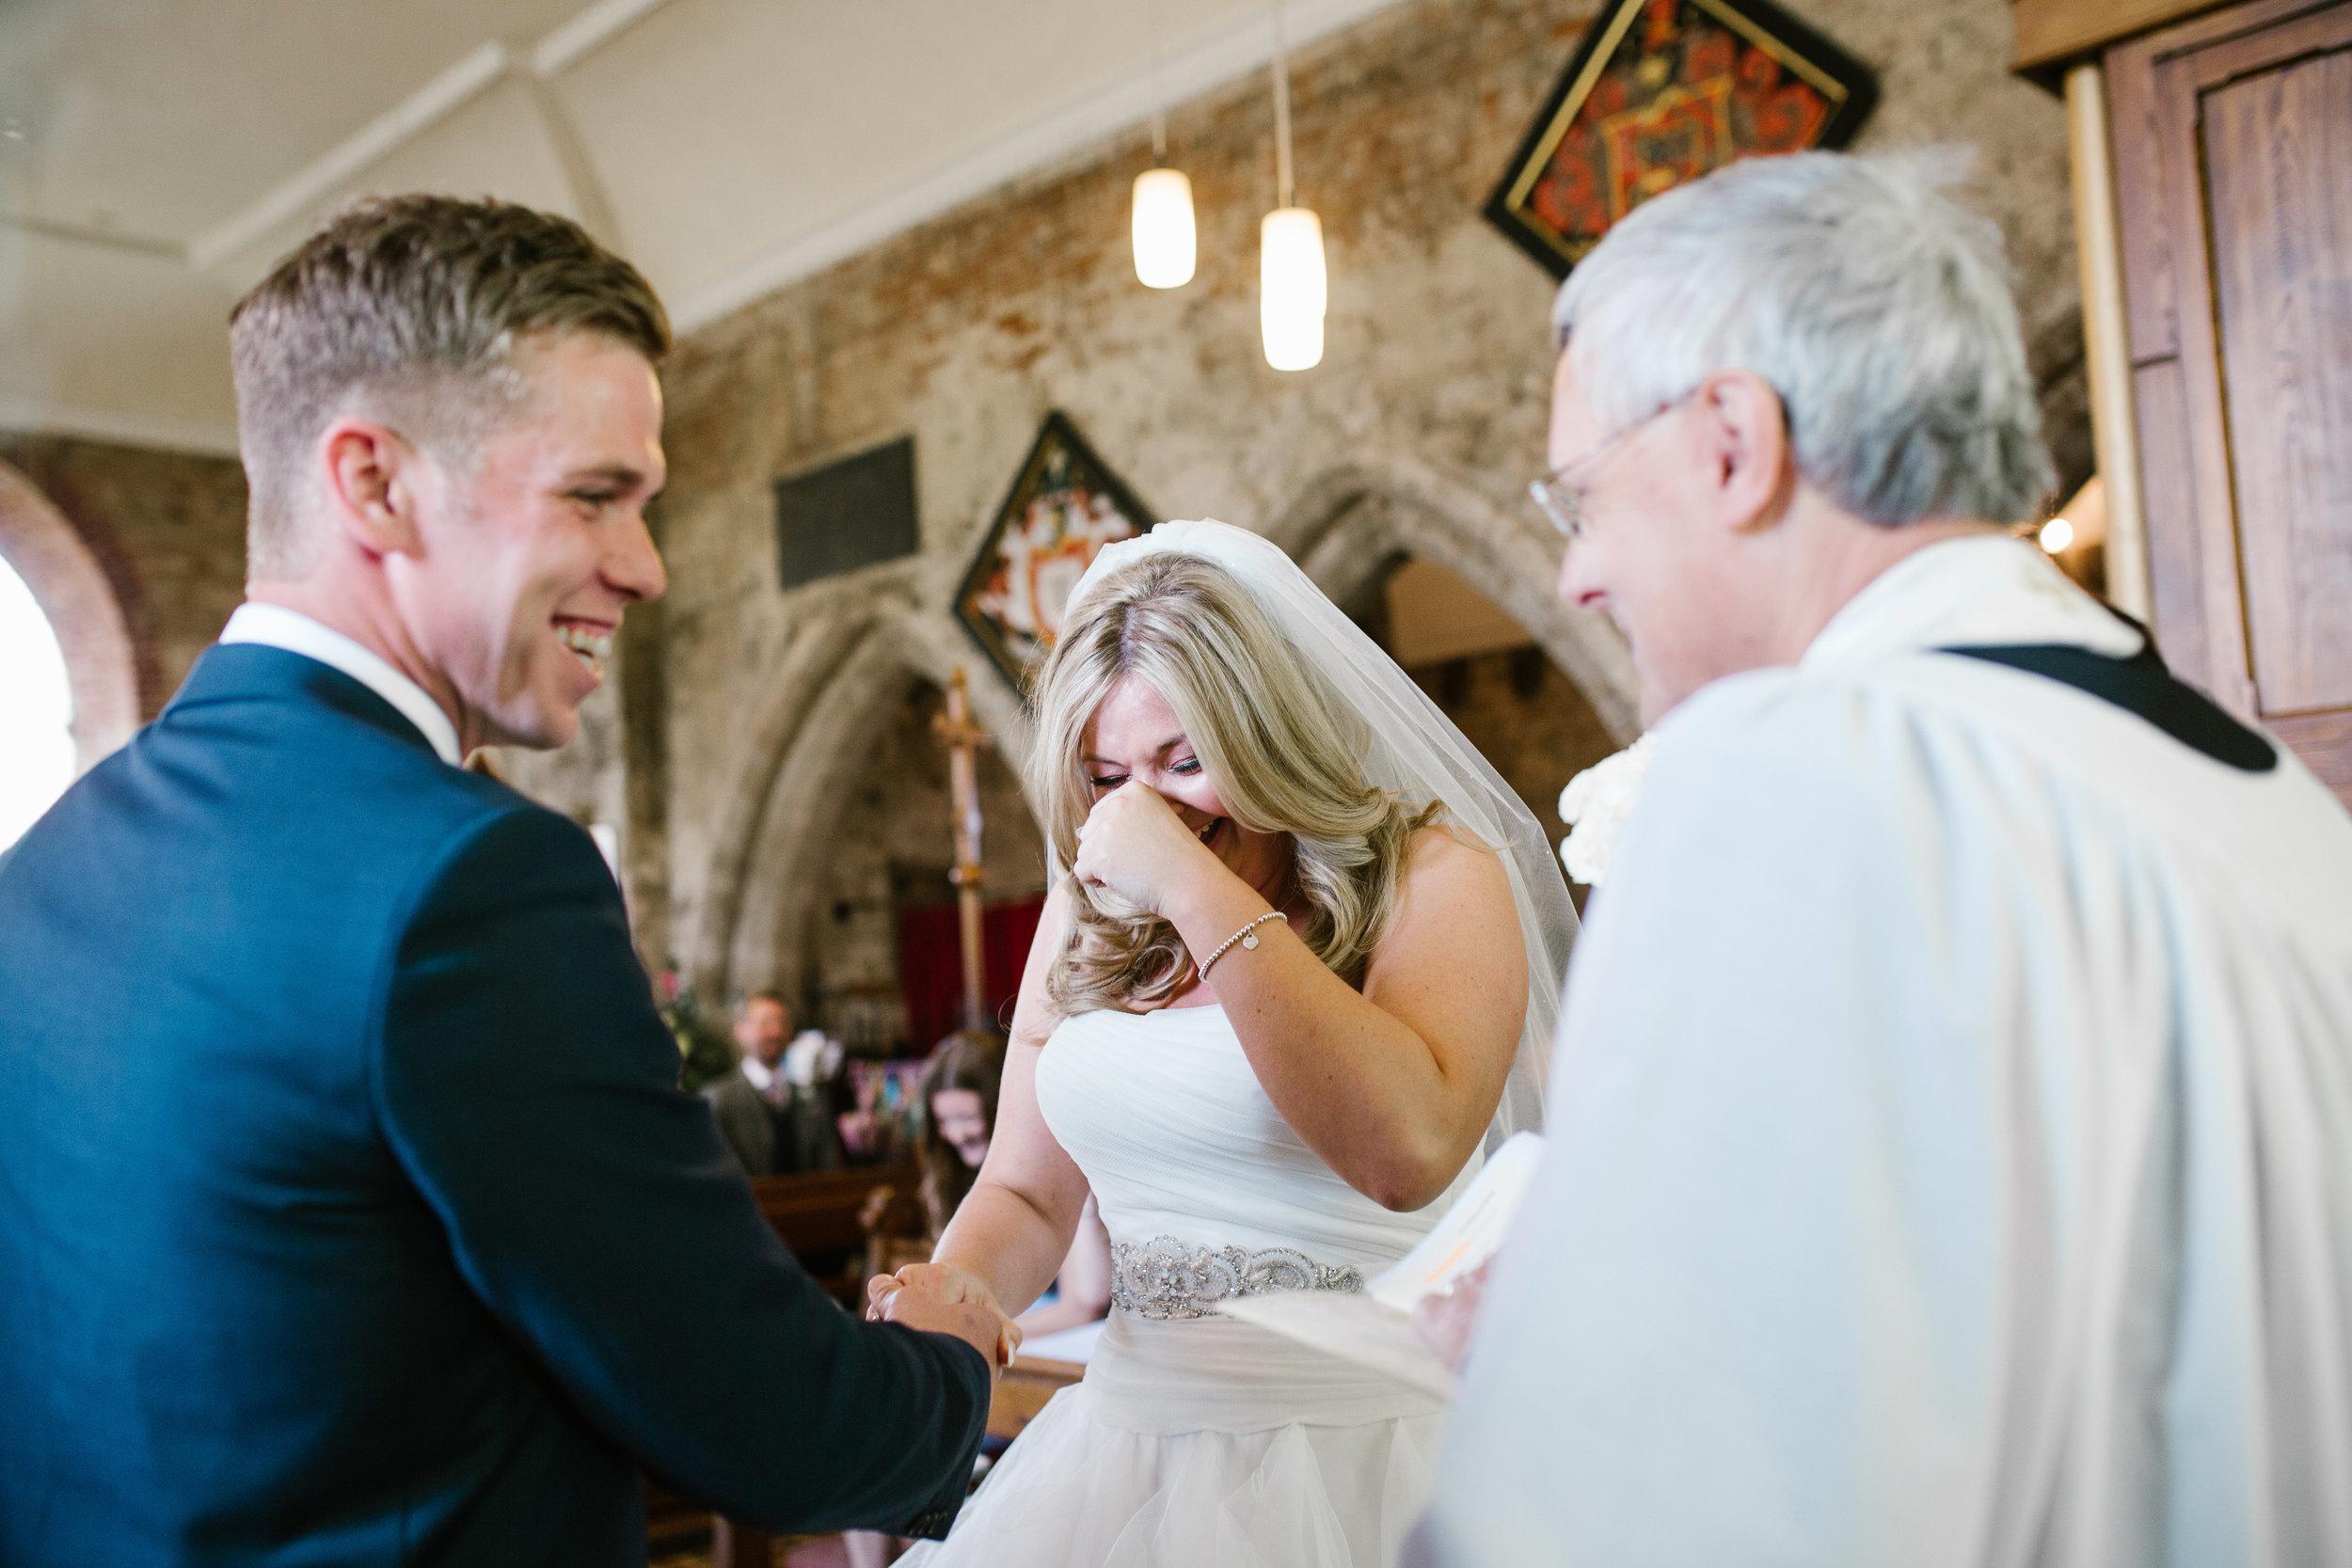 Staffordshire wedding, Staffordshire wedding photographer, marquee wedding, wedding fun-125.jpg